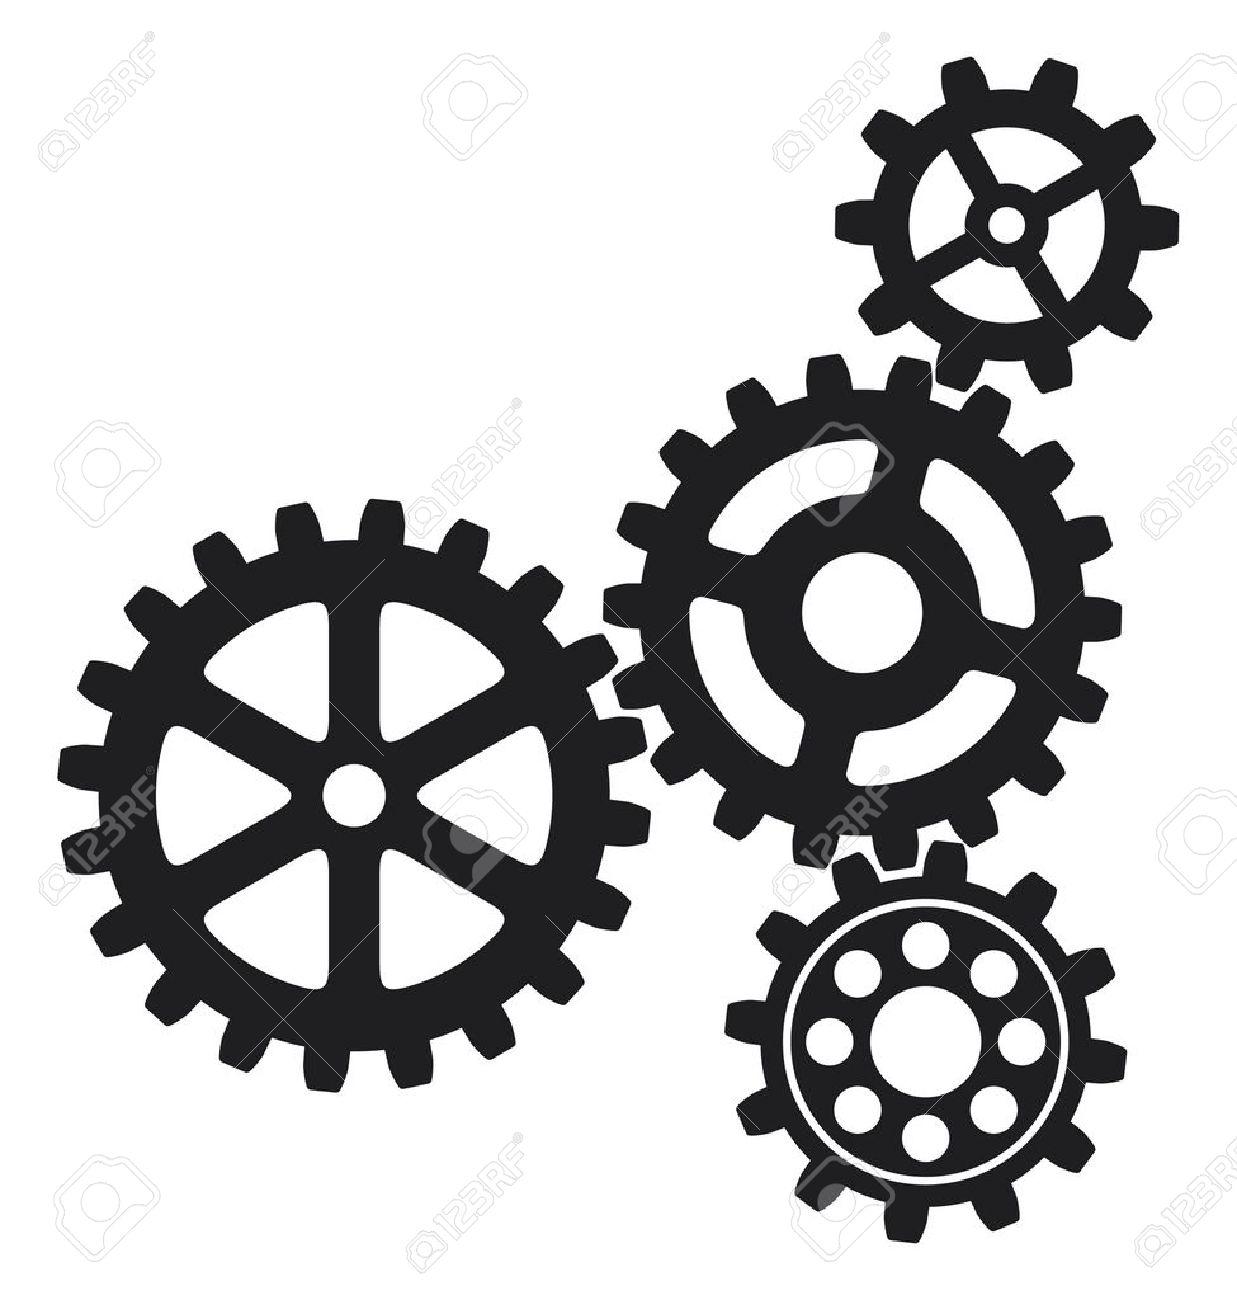 Gears clipart mechanical gear Growing 14974438 icon Stock gears